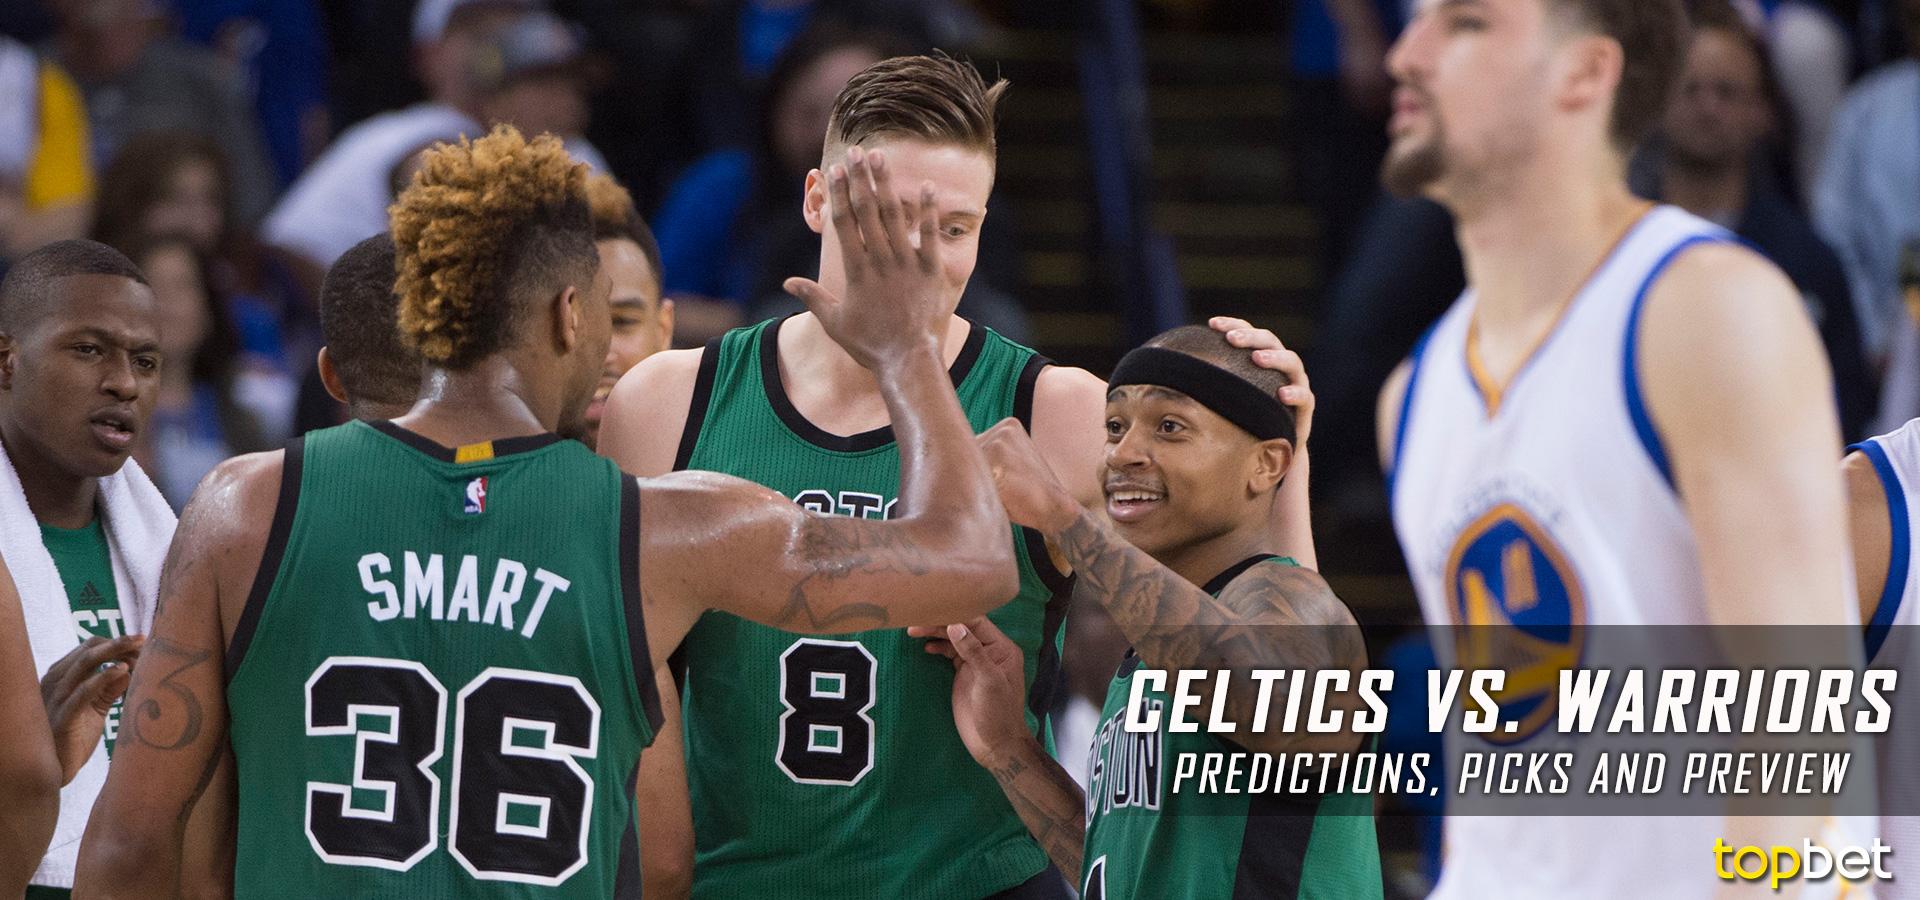 celtics vs warriors - photo #32